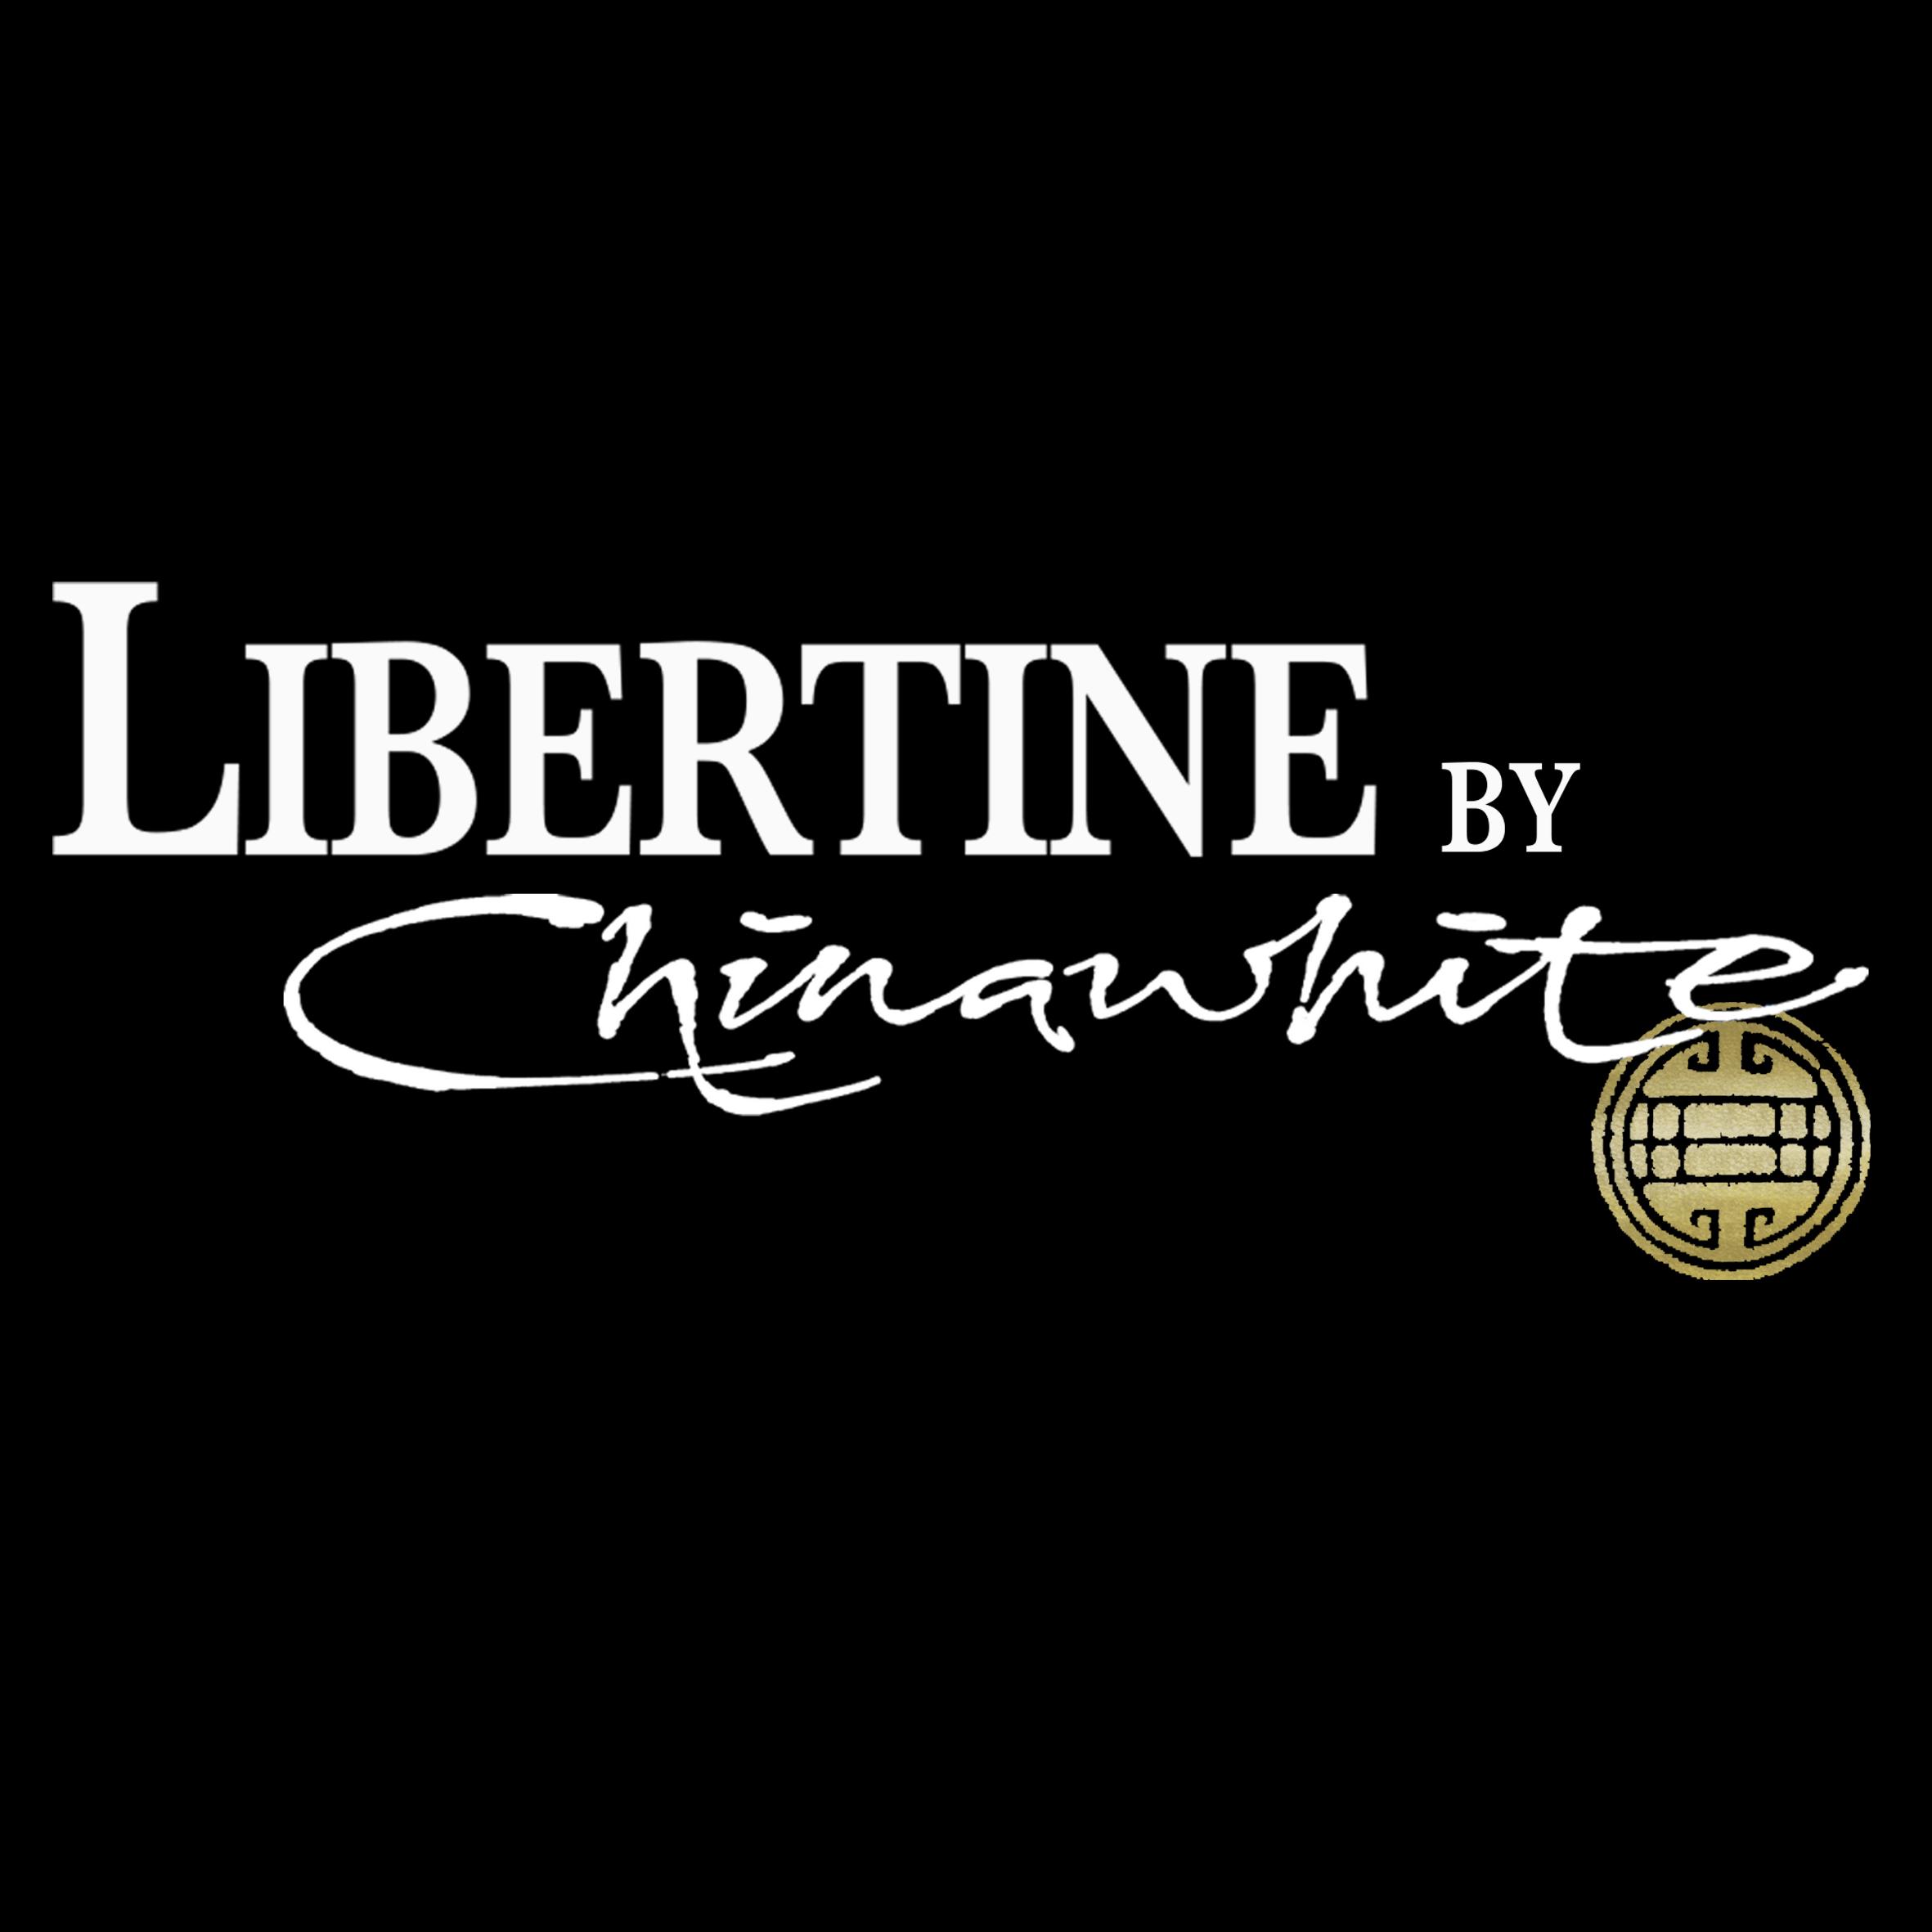 echangiste logo libertin